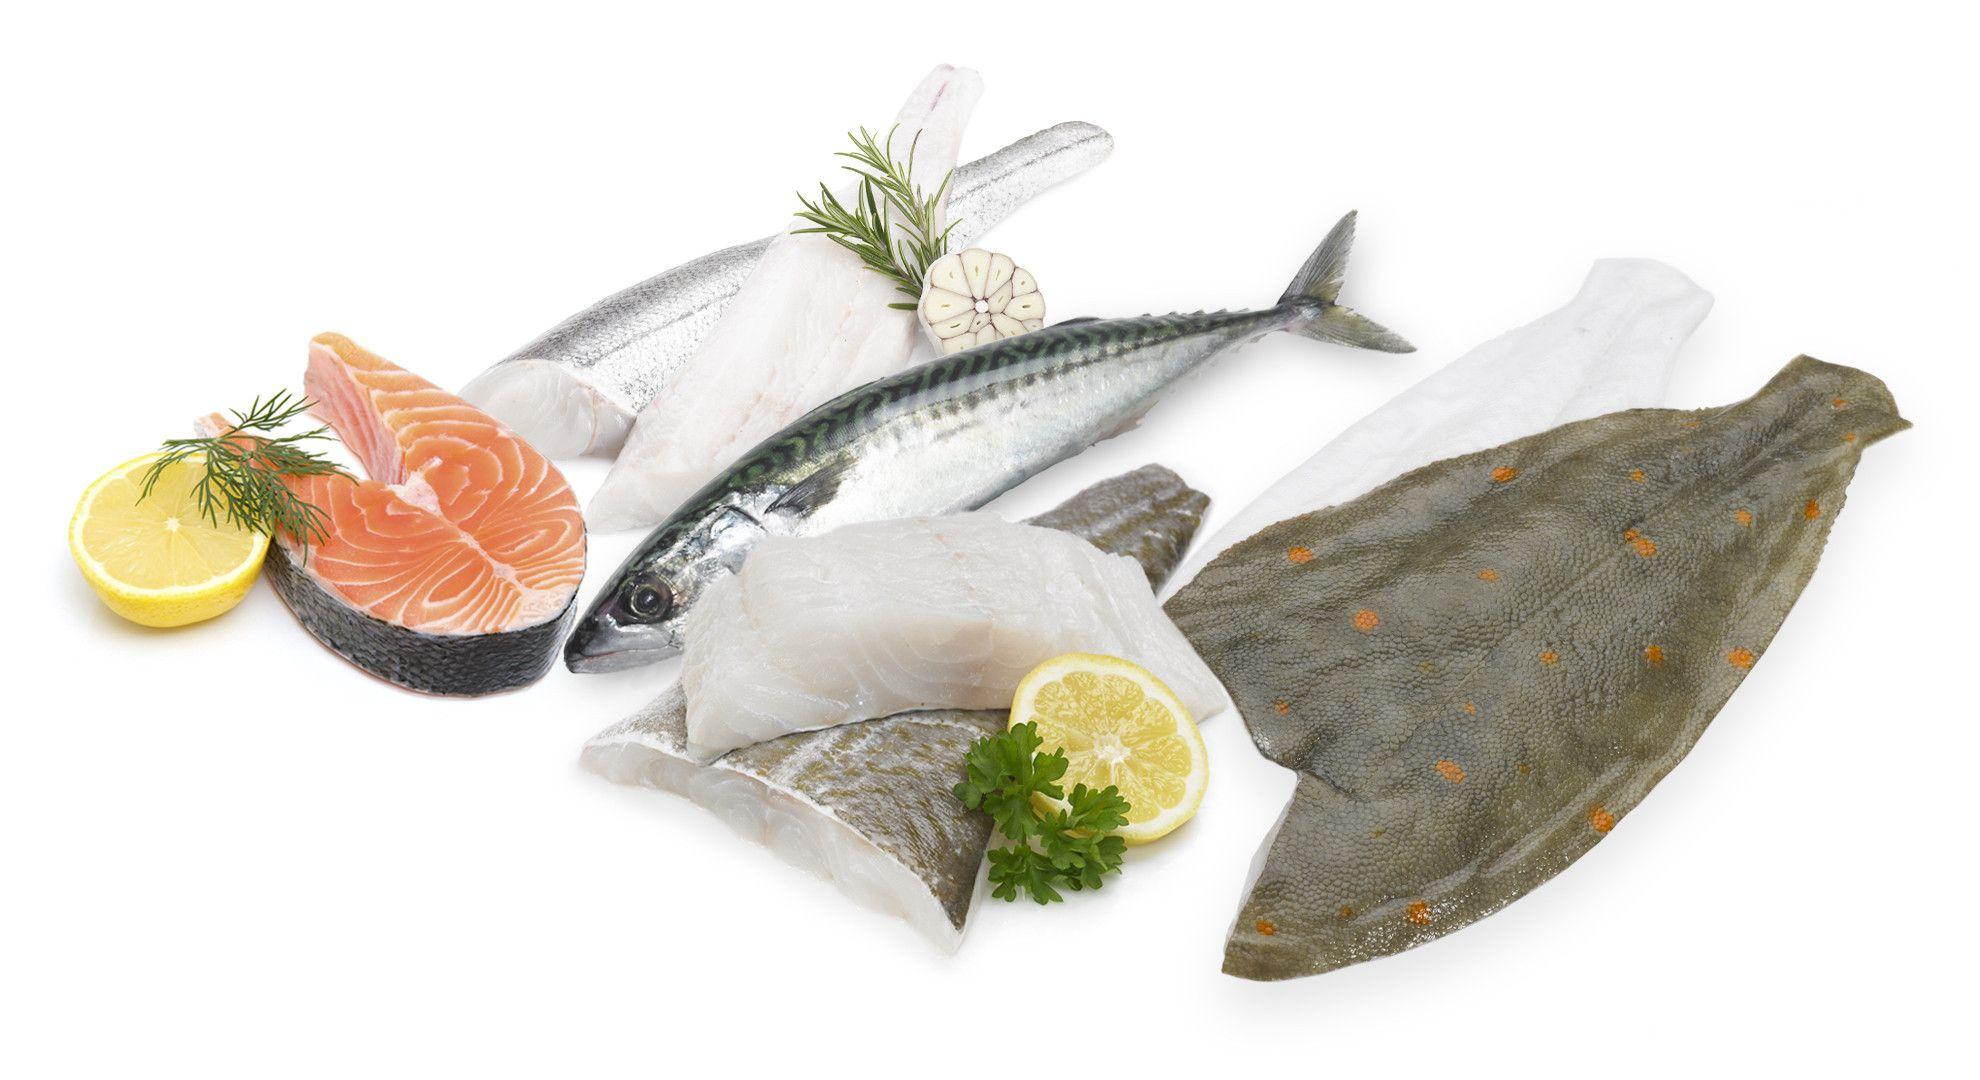 Bradley Fish Is Providing All Types Of Fresh Fish Food To Your Door Our Online Store Allows Yo Luxury Fish Pie Crispy Sweet Potato Wedges Crispy Sweet Potato